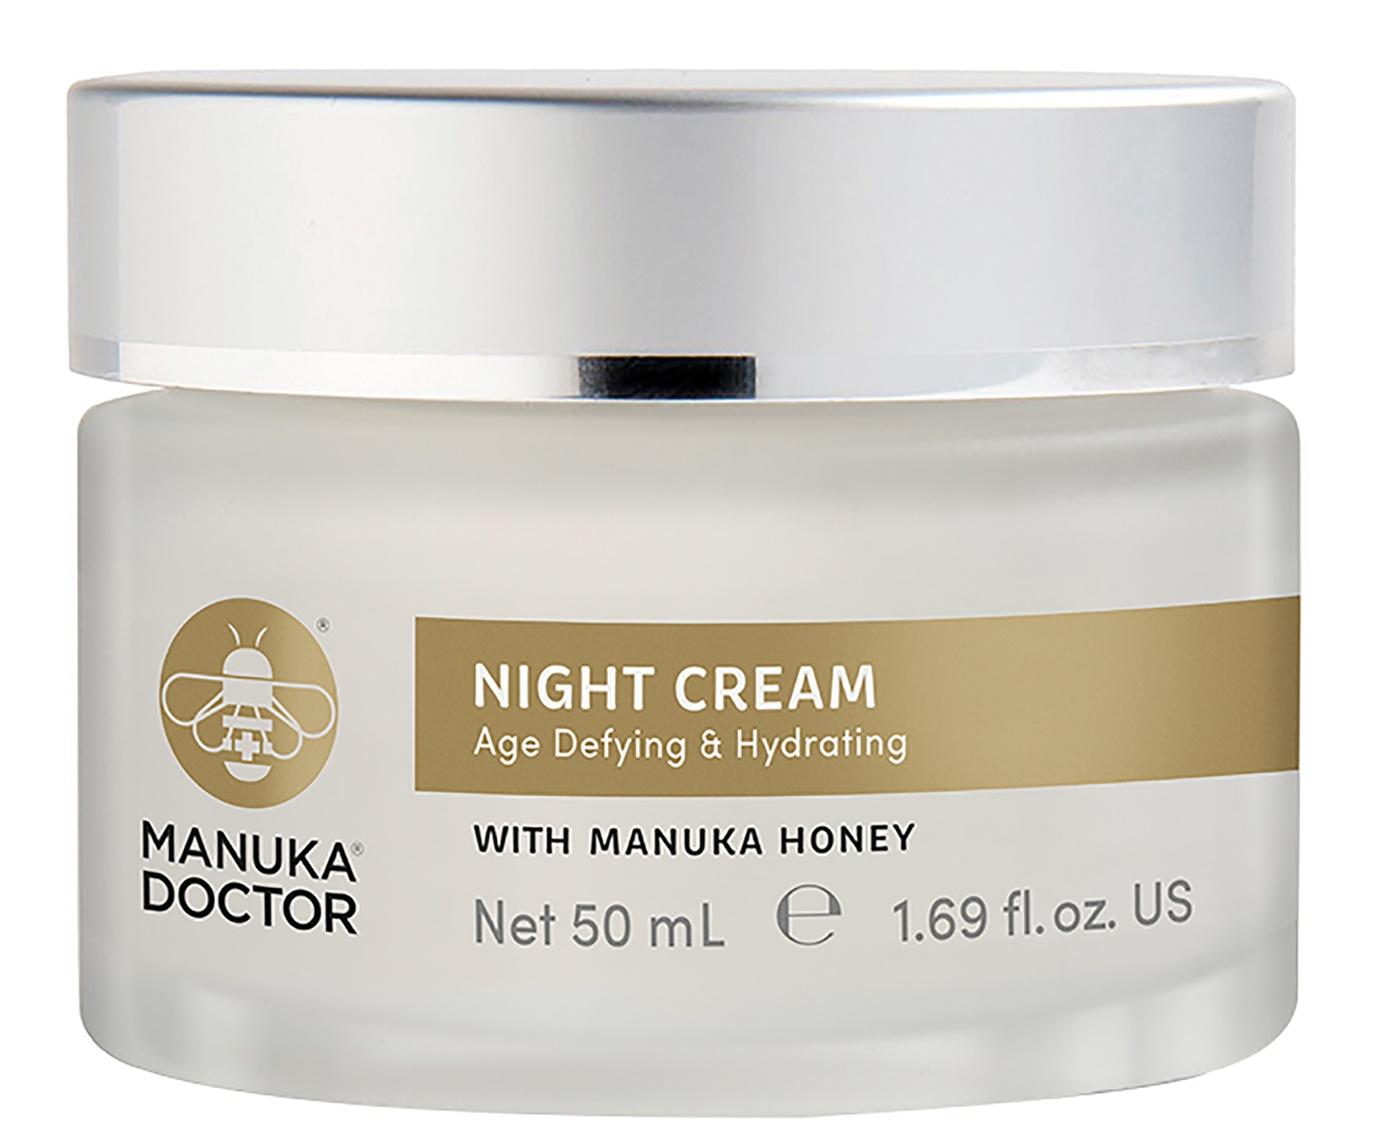 Manuka Doctor Manuka Skincare Night Cream